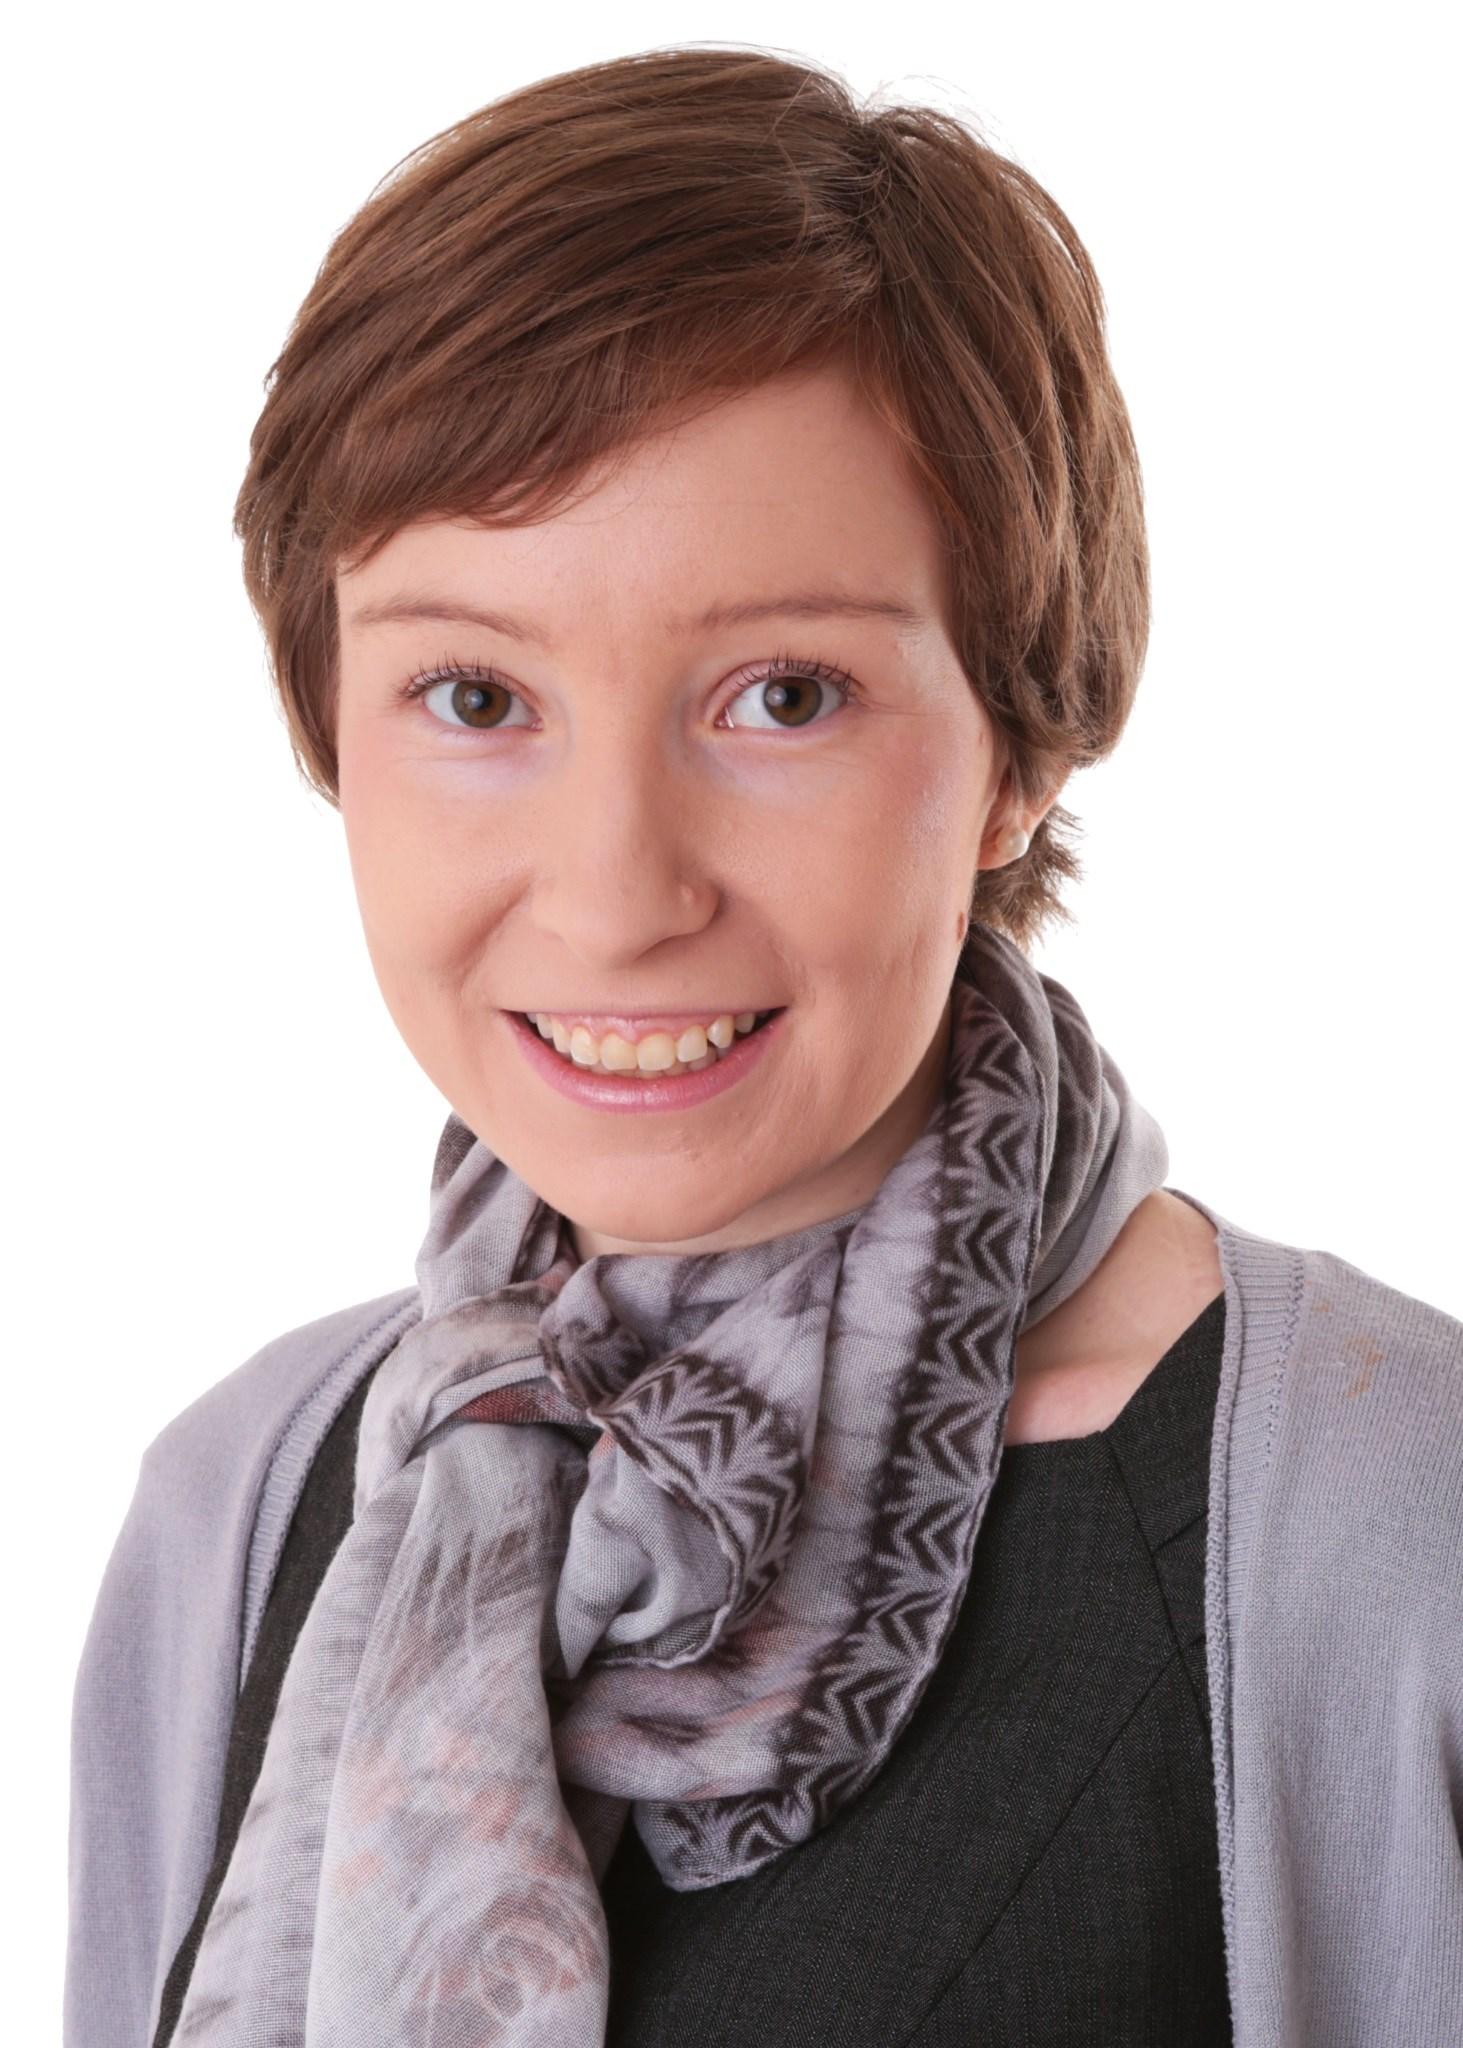 Rachel Howard, associate director, Research Partnership